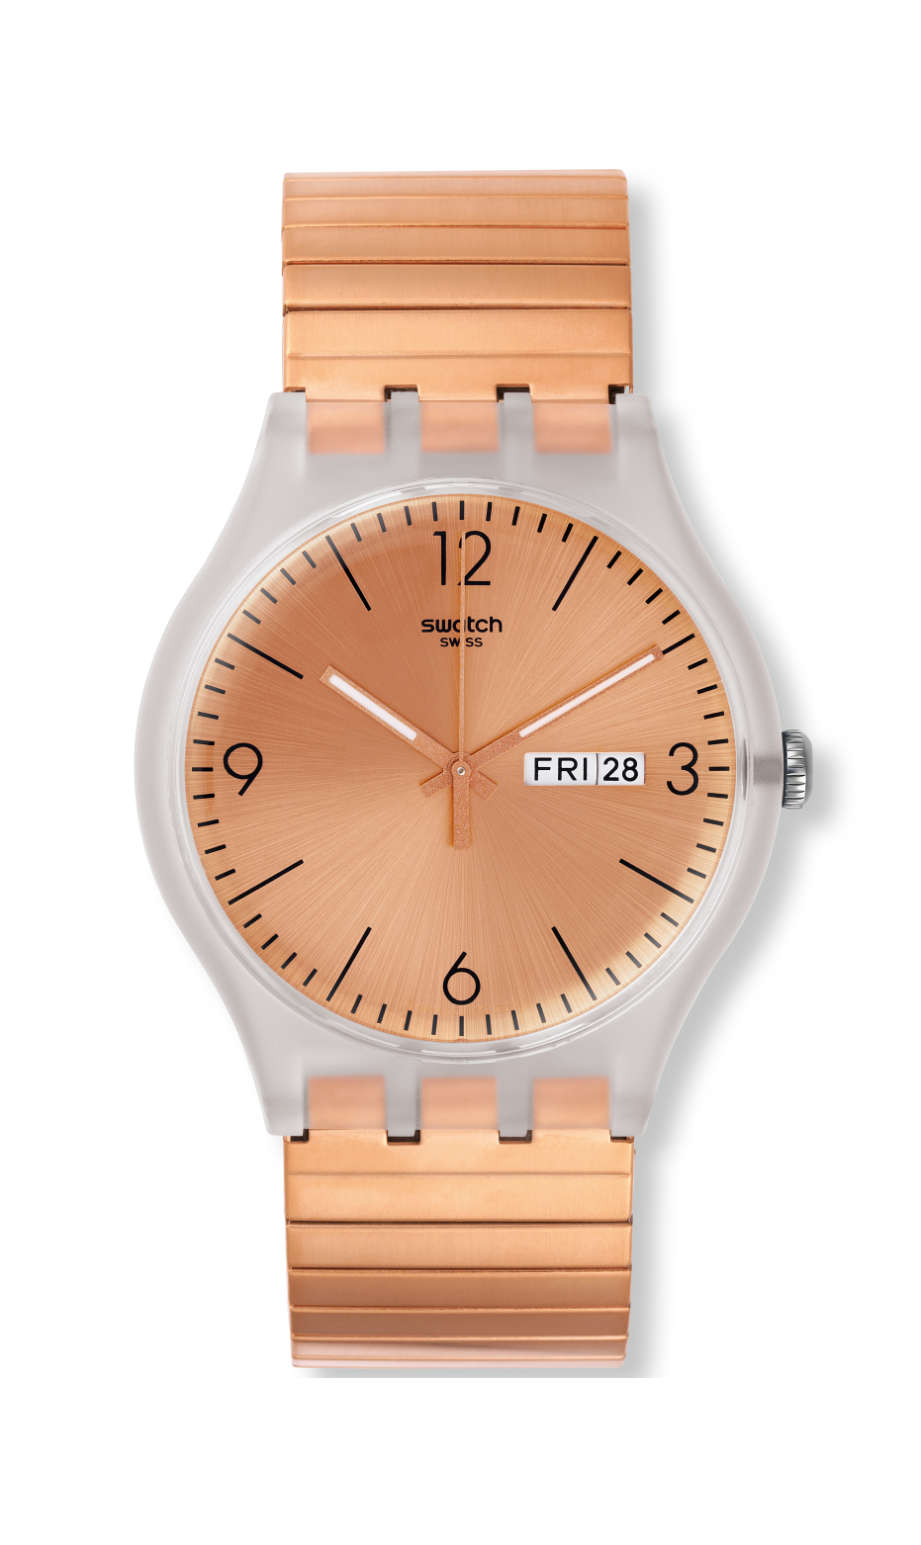 Swatch - ROSTFREI - 1